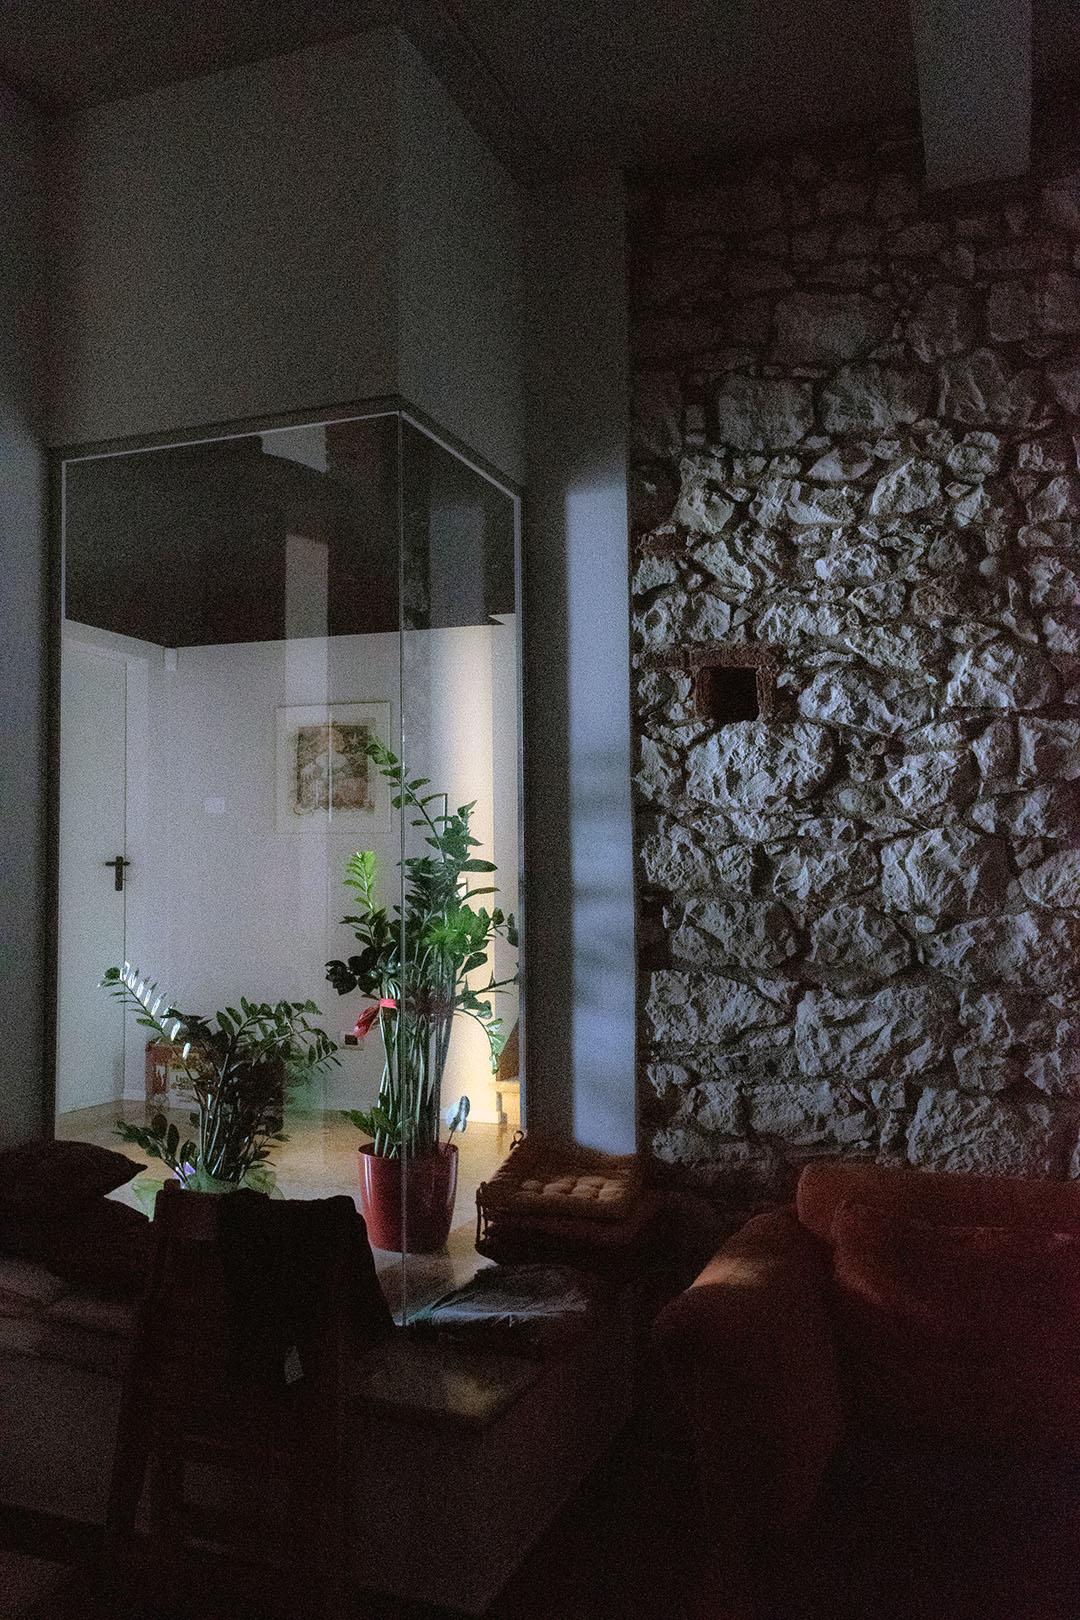 indoor sistema vetro chiusura personalizzata